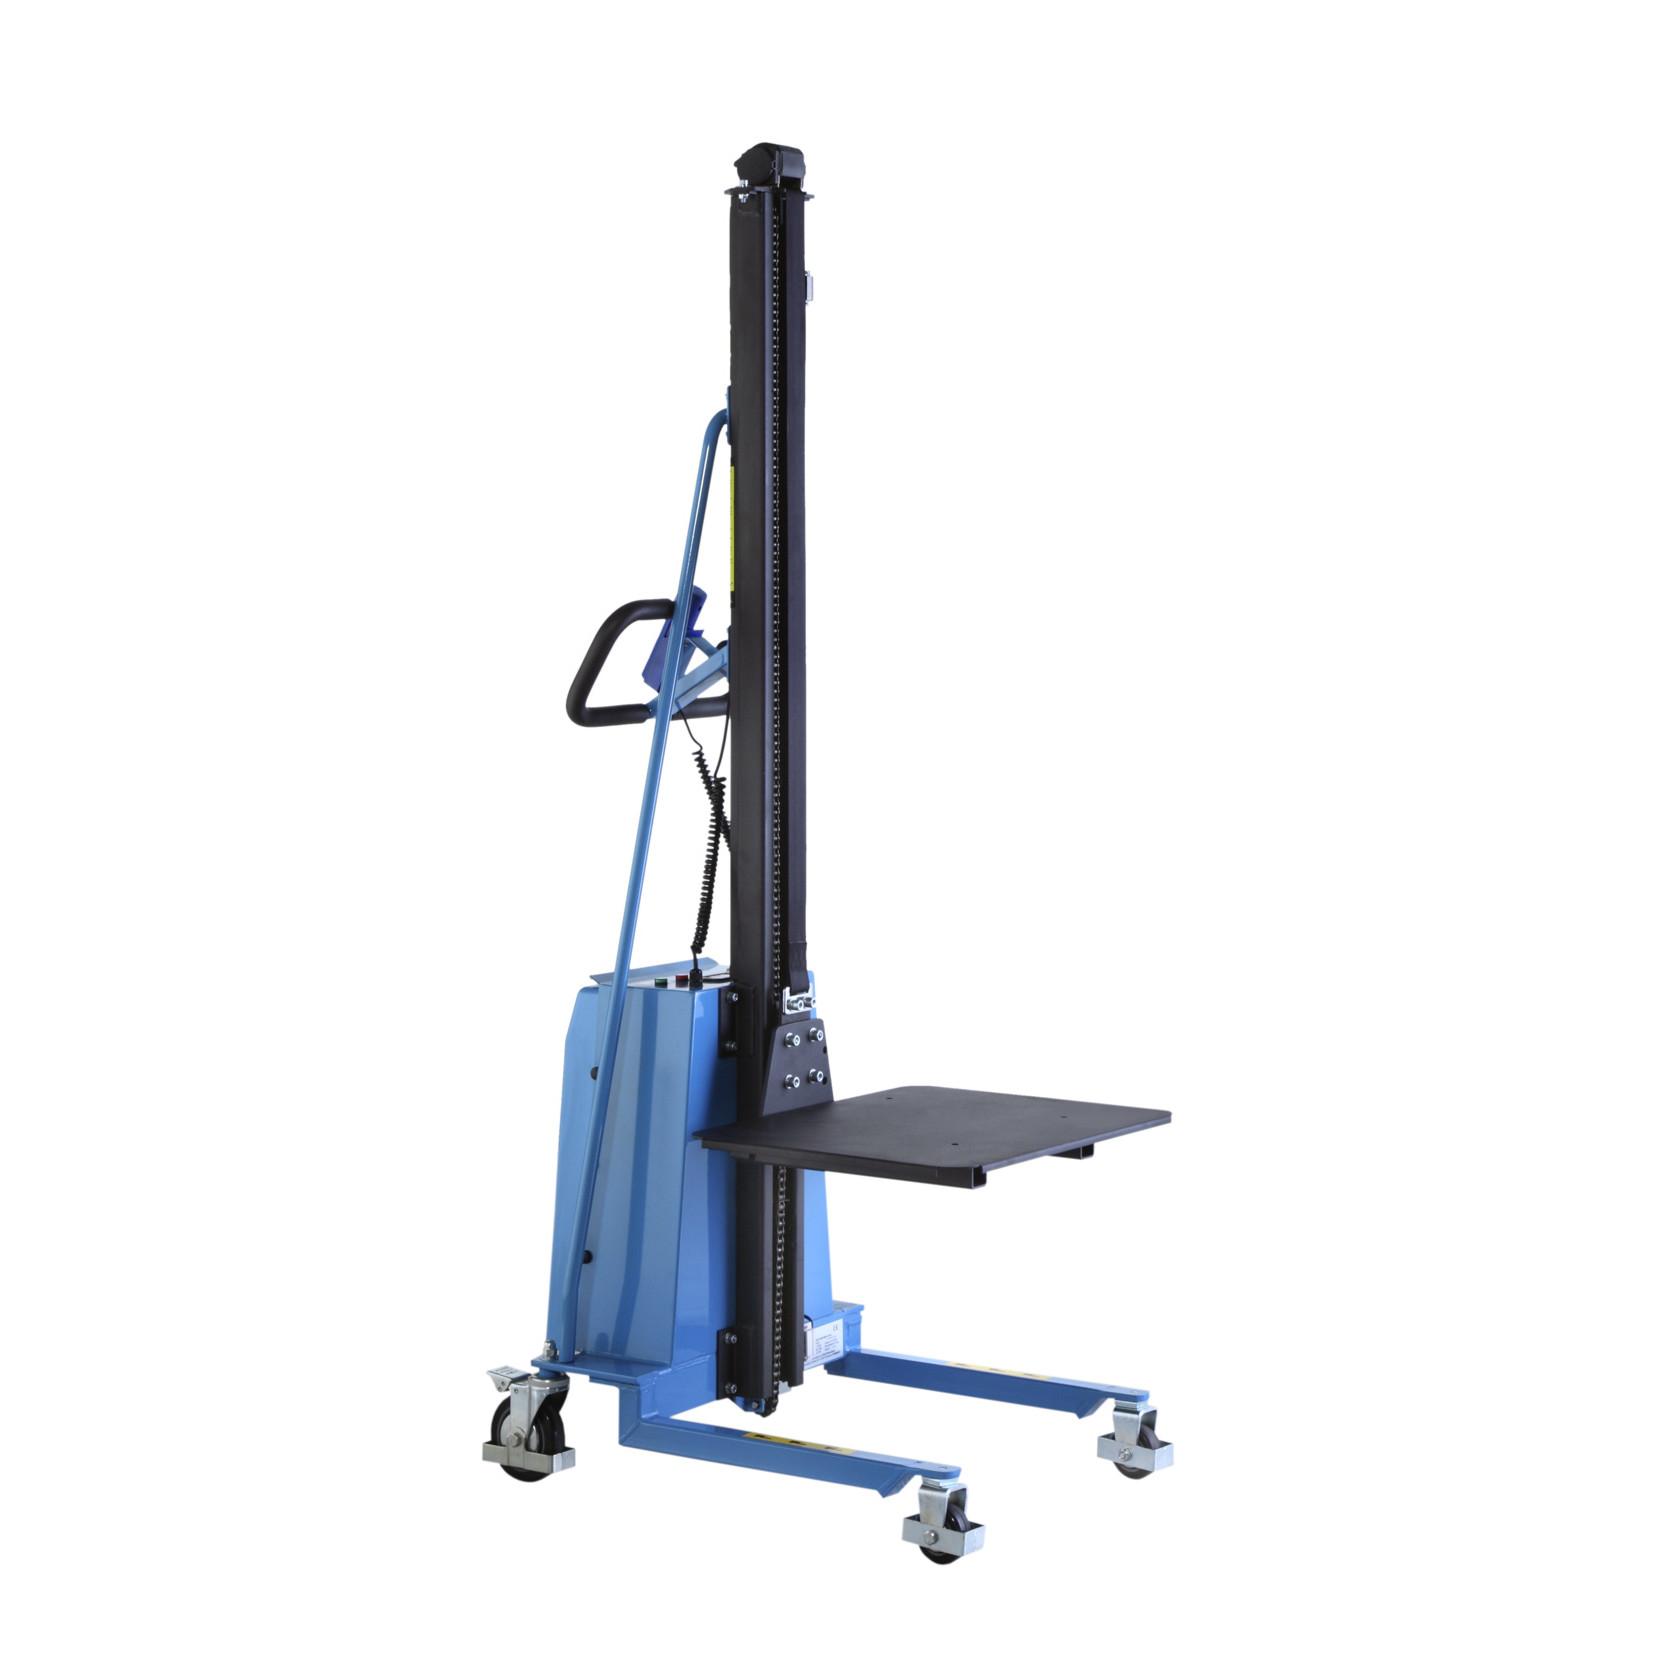 Minilifter mit Rollendorn im companyshop24